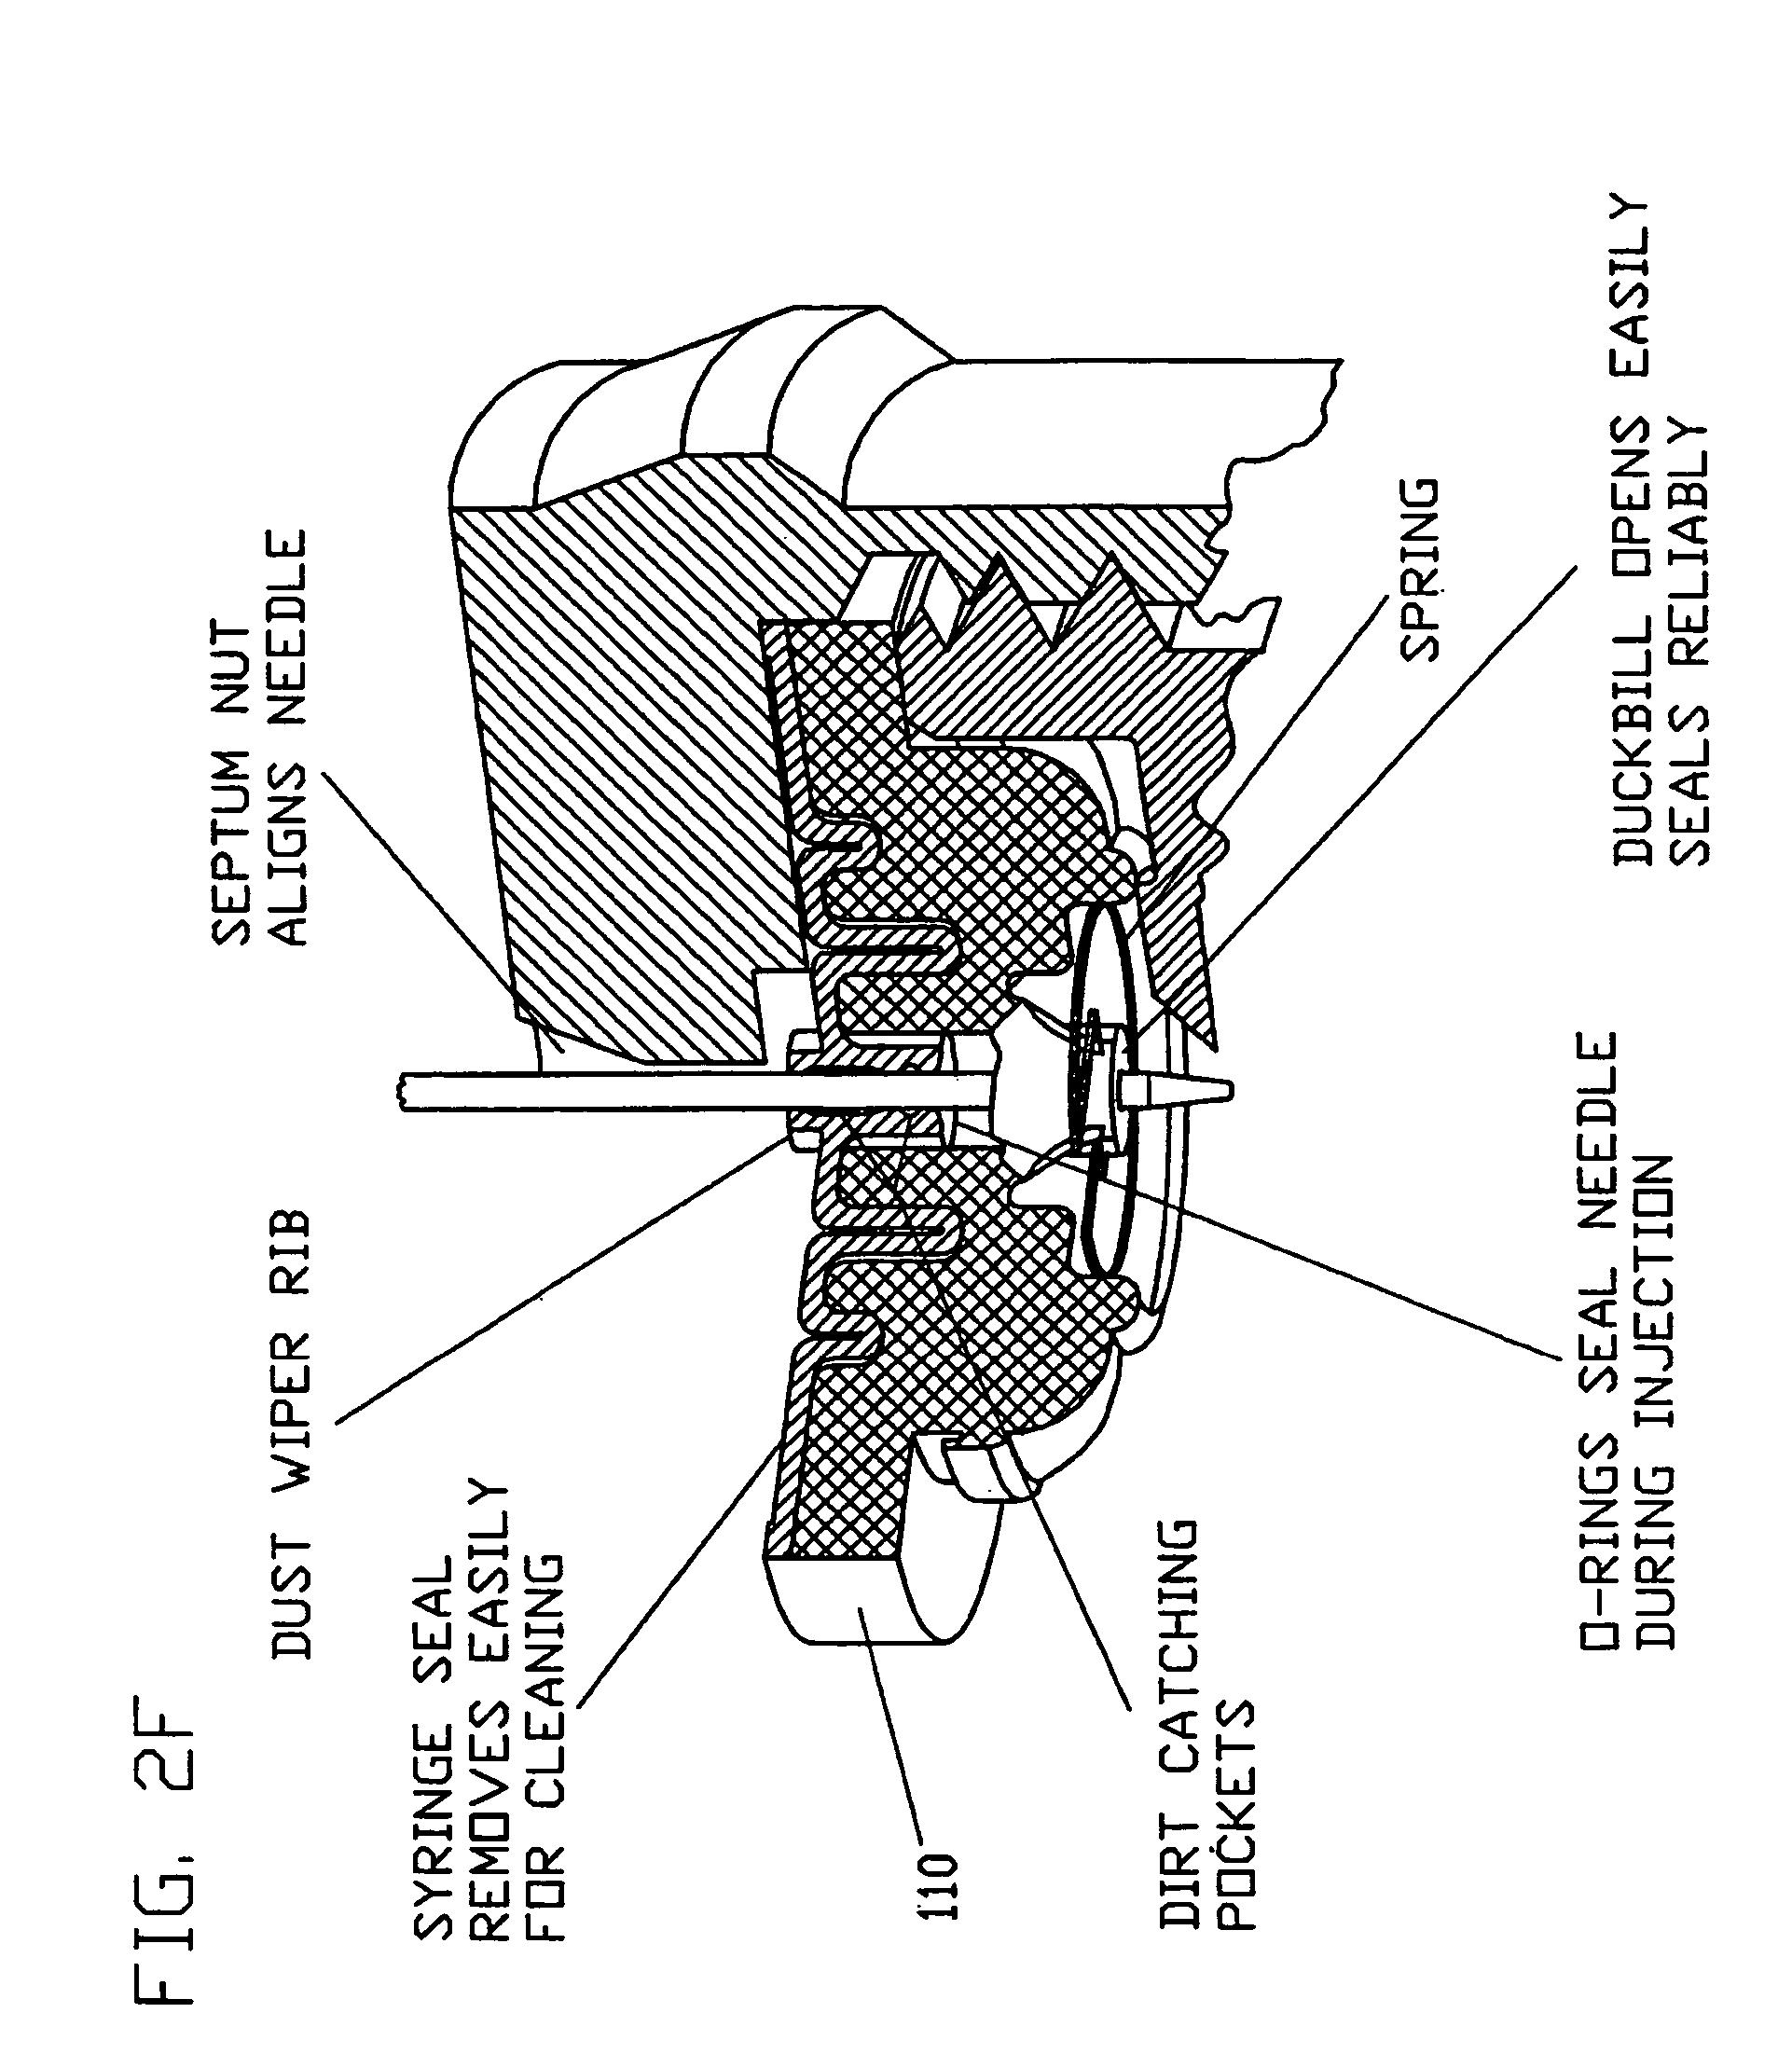 speaker ledningsdiagram series and parallel